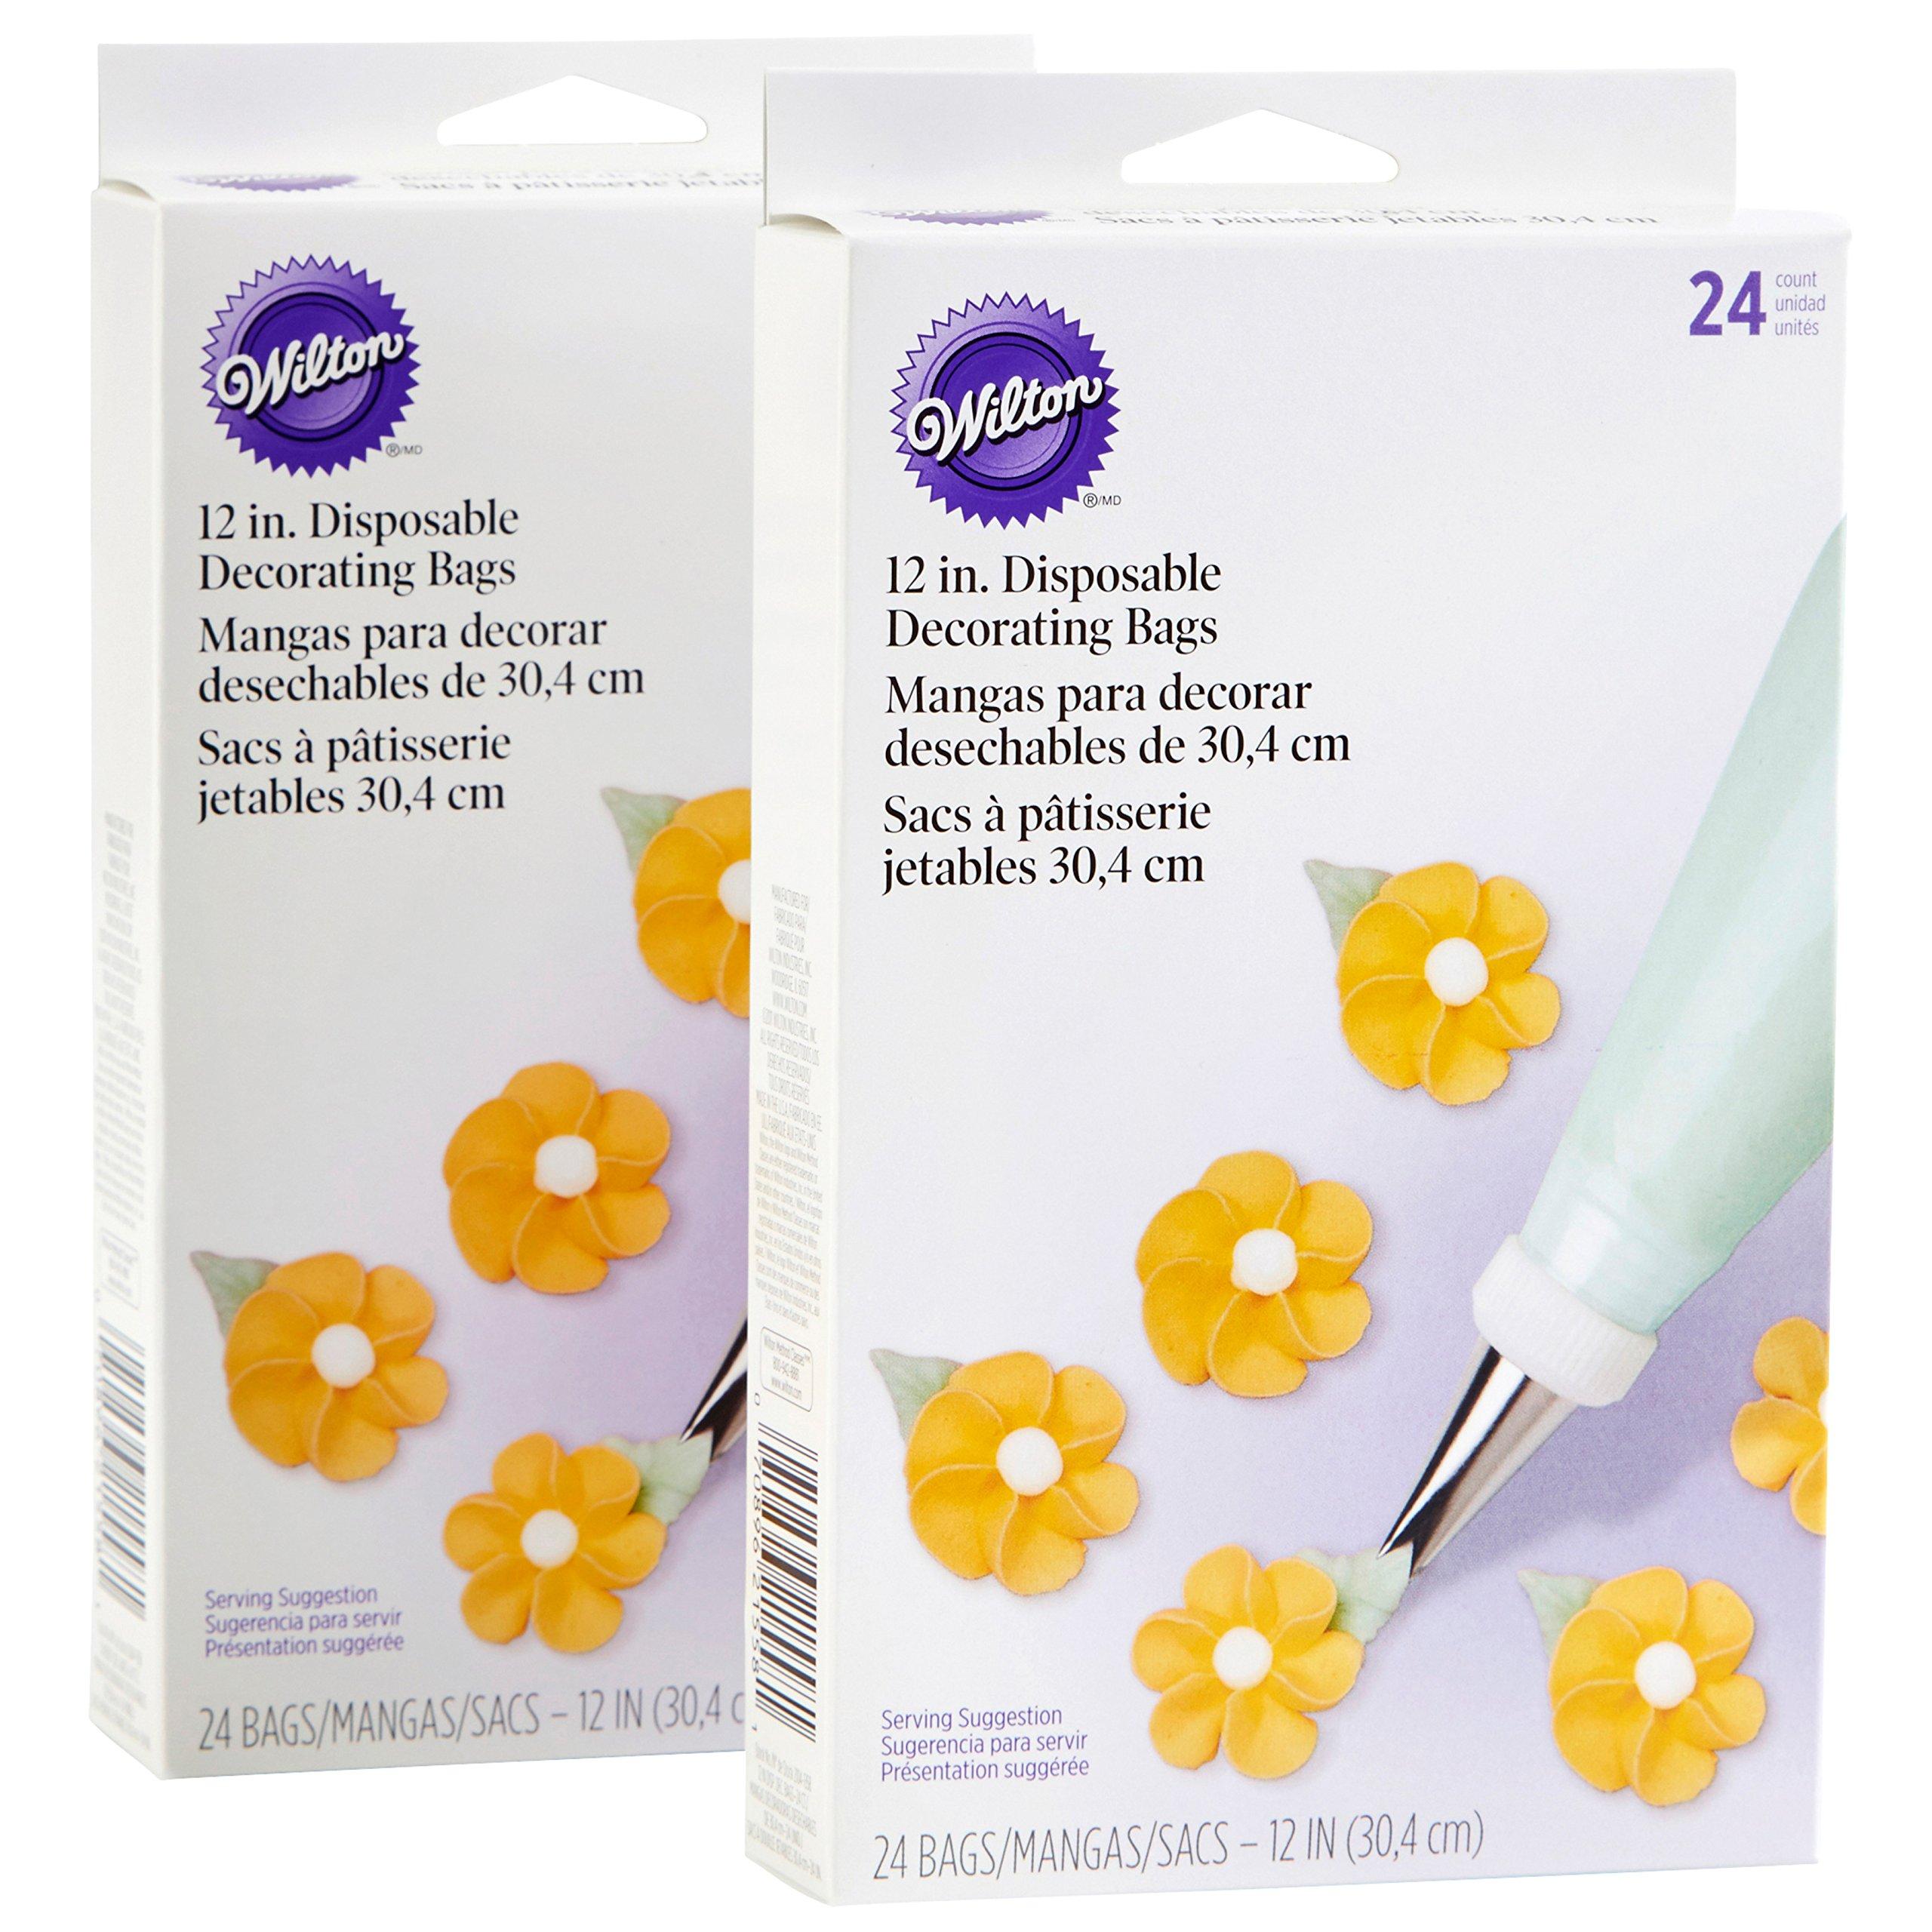 Wilton 12-Inch Disposable Decorating Bag Set, 4-Pack